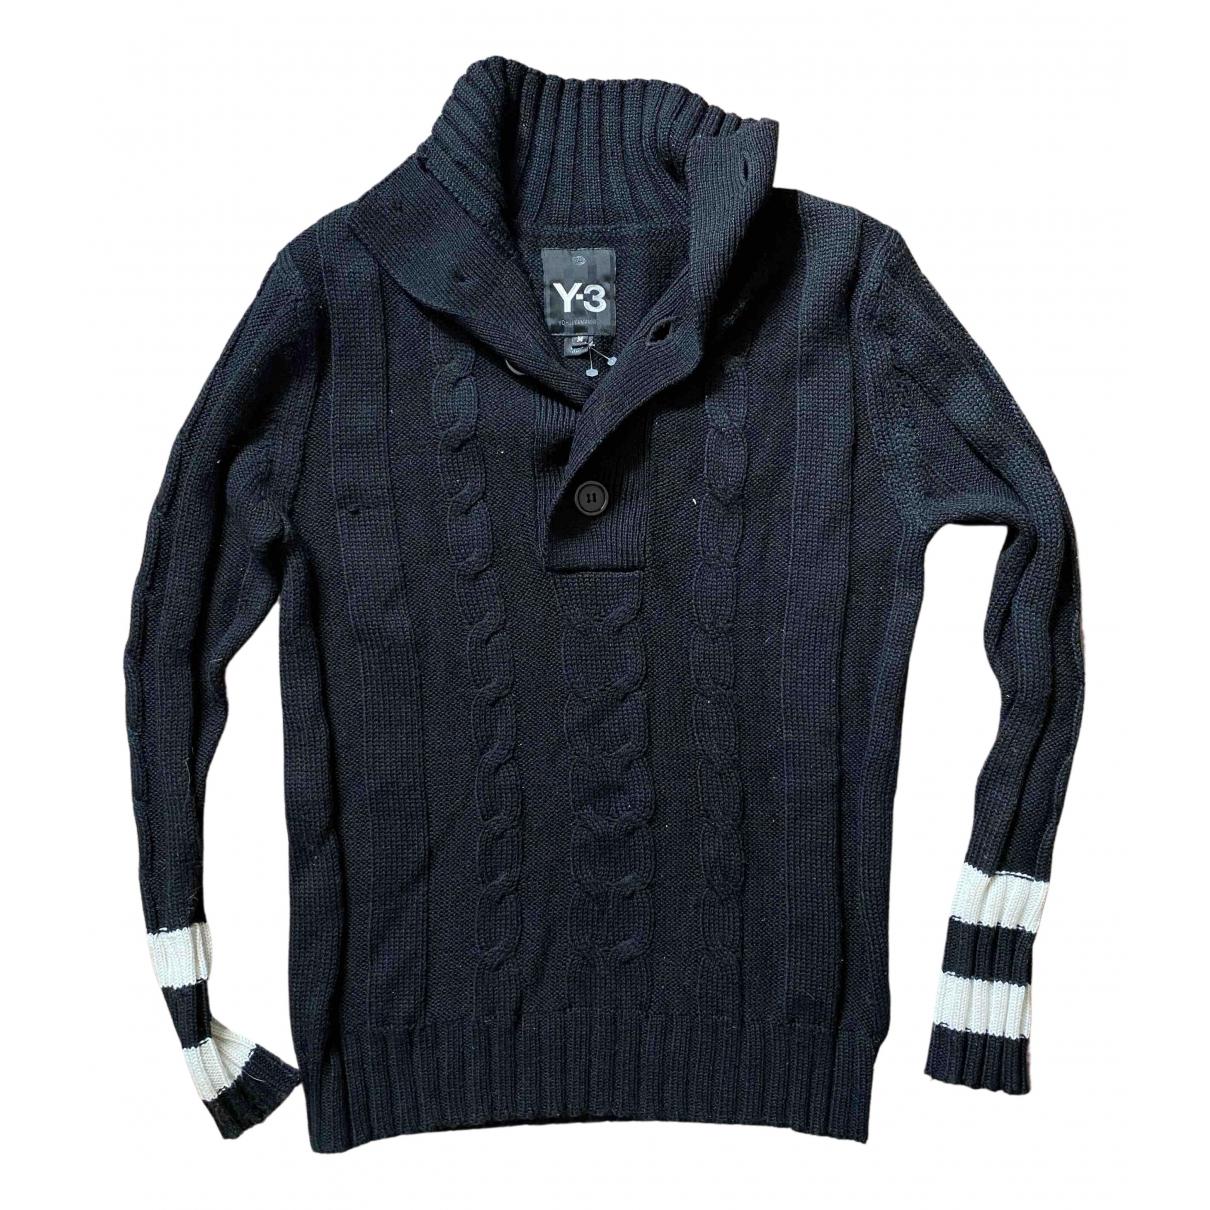 Y-3 By Yohji Yamamoto - Pull   pour femme en laine - noir